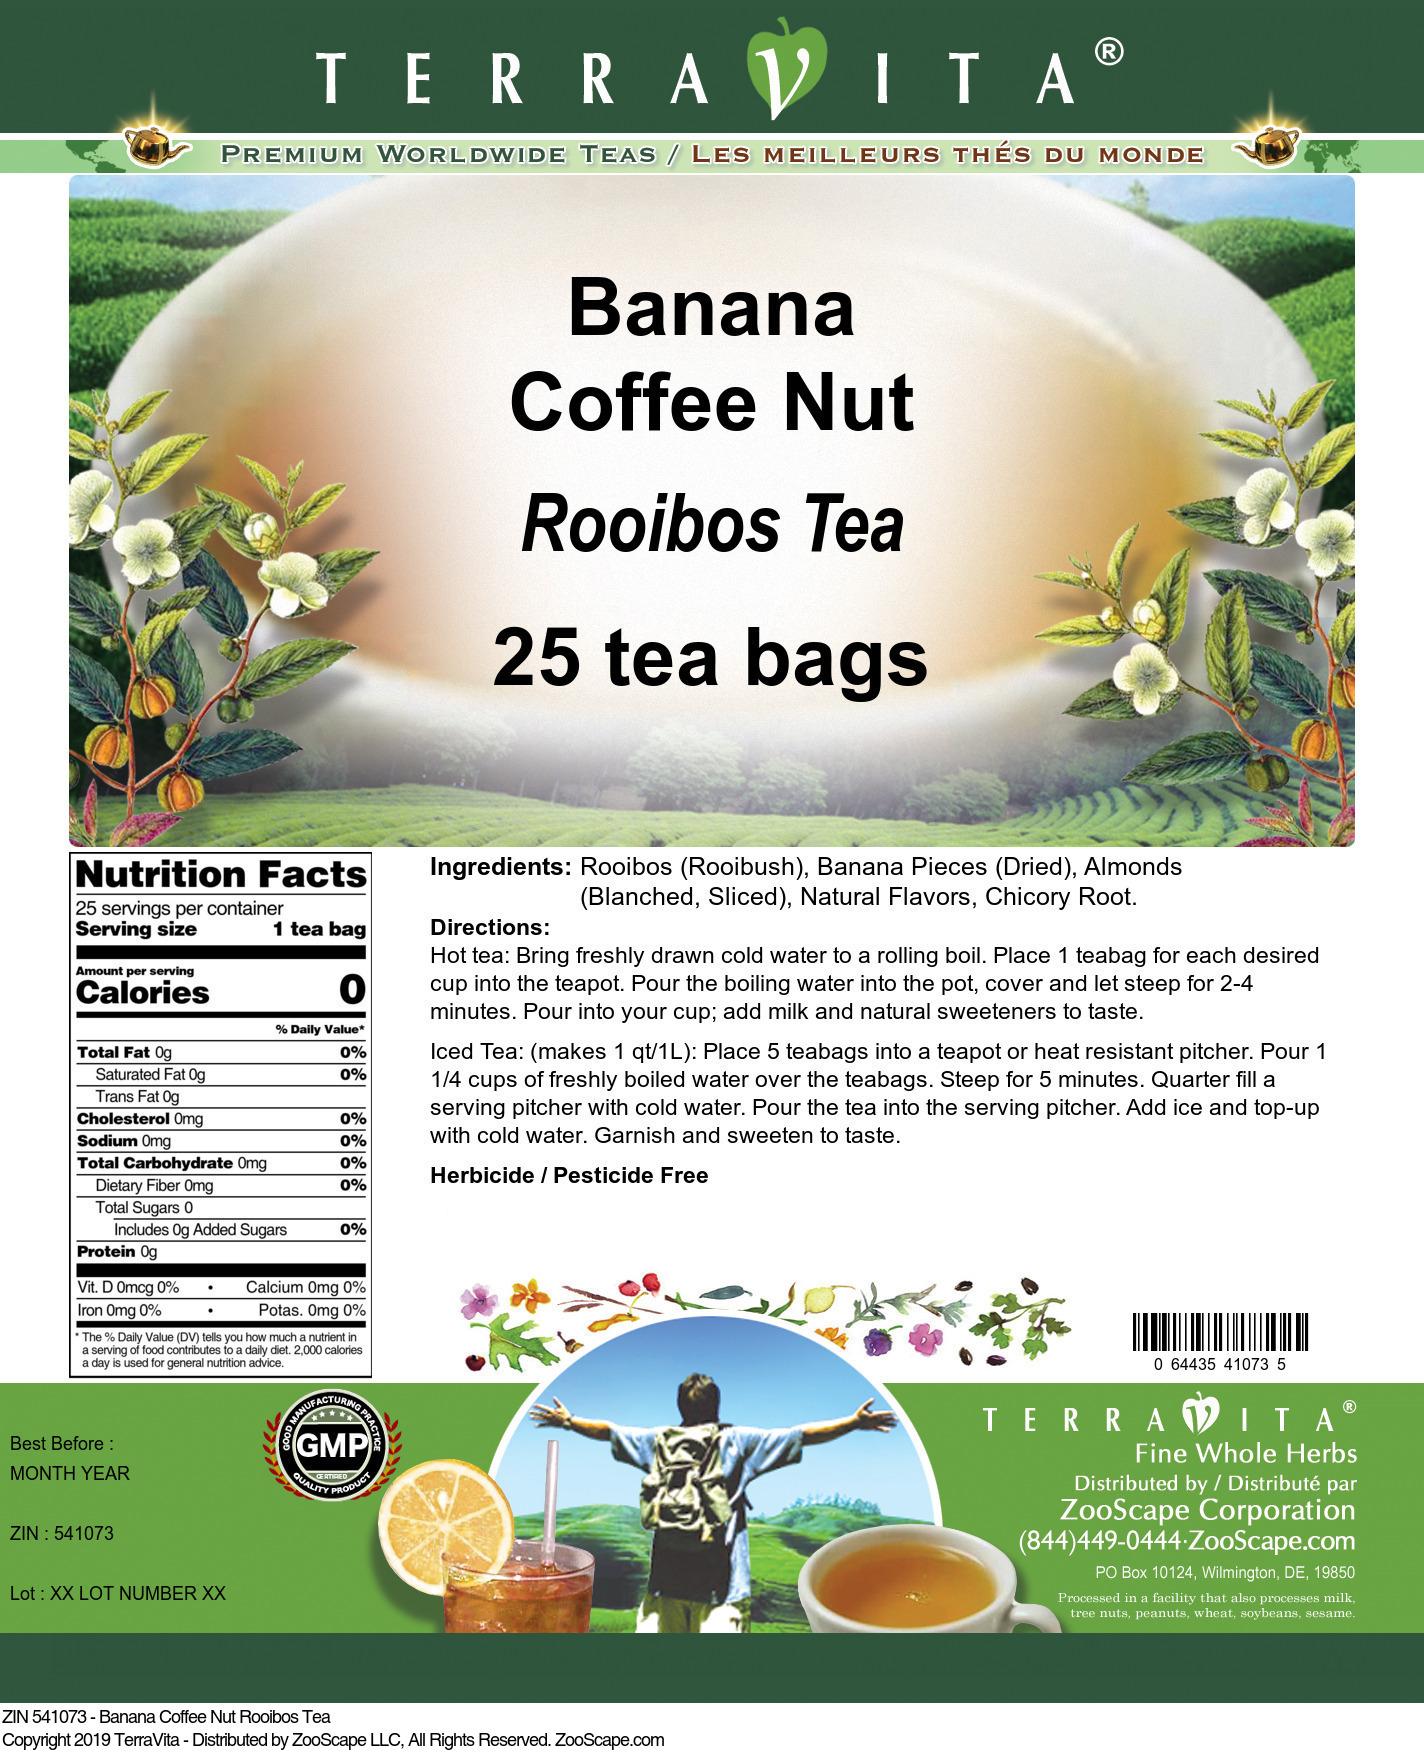 Banana Coffee Nut Rooibos Tea